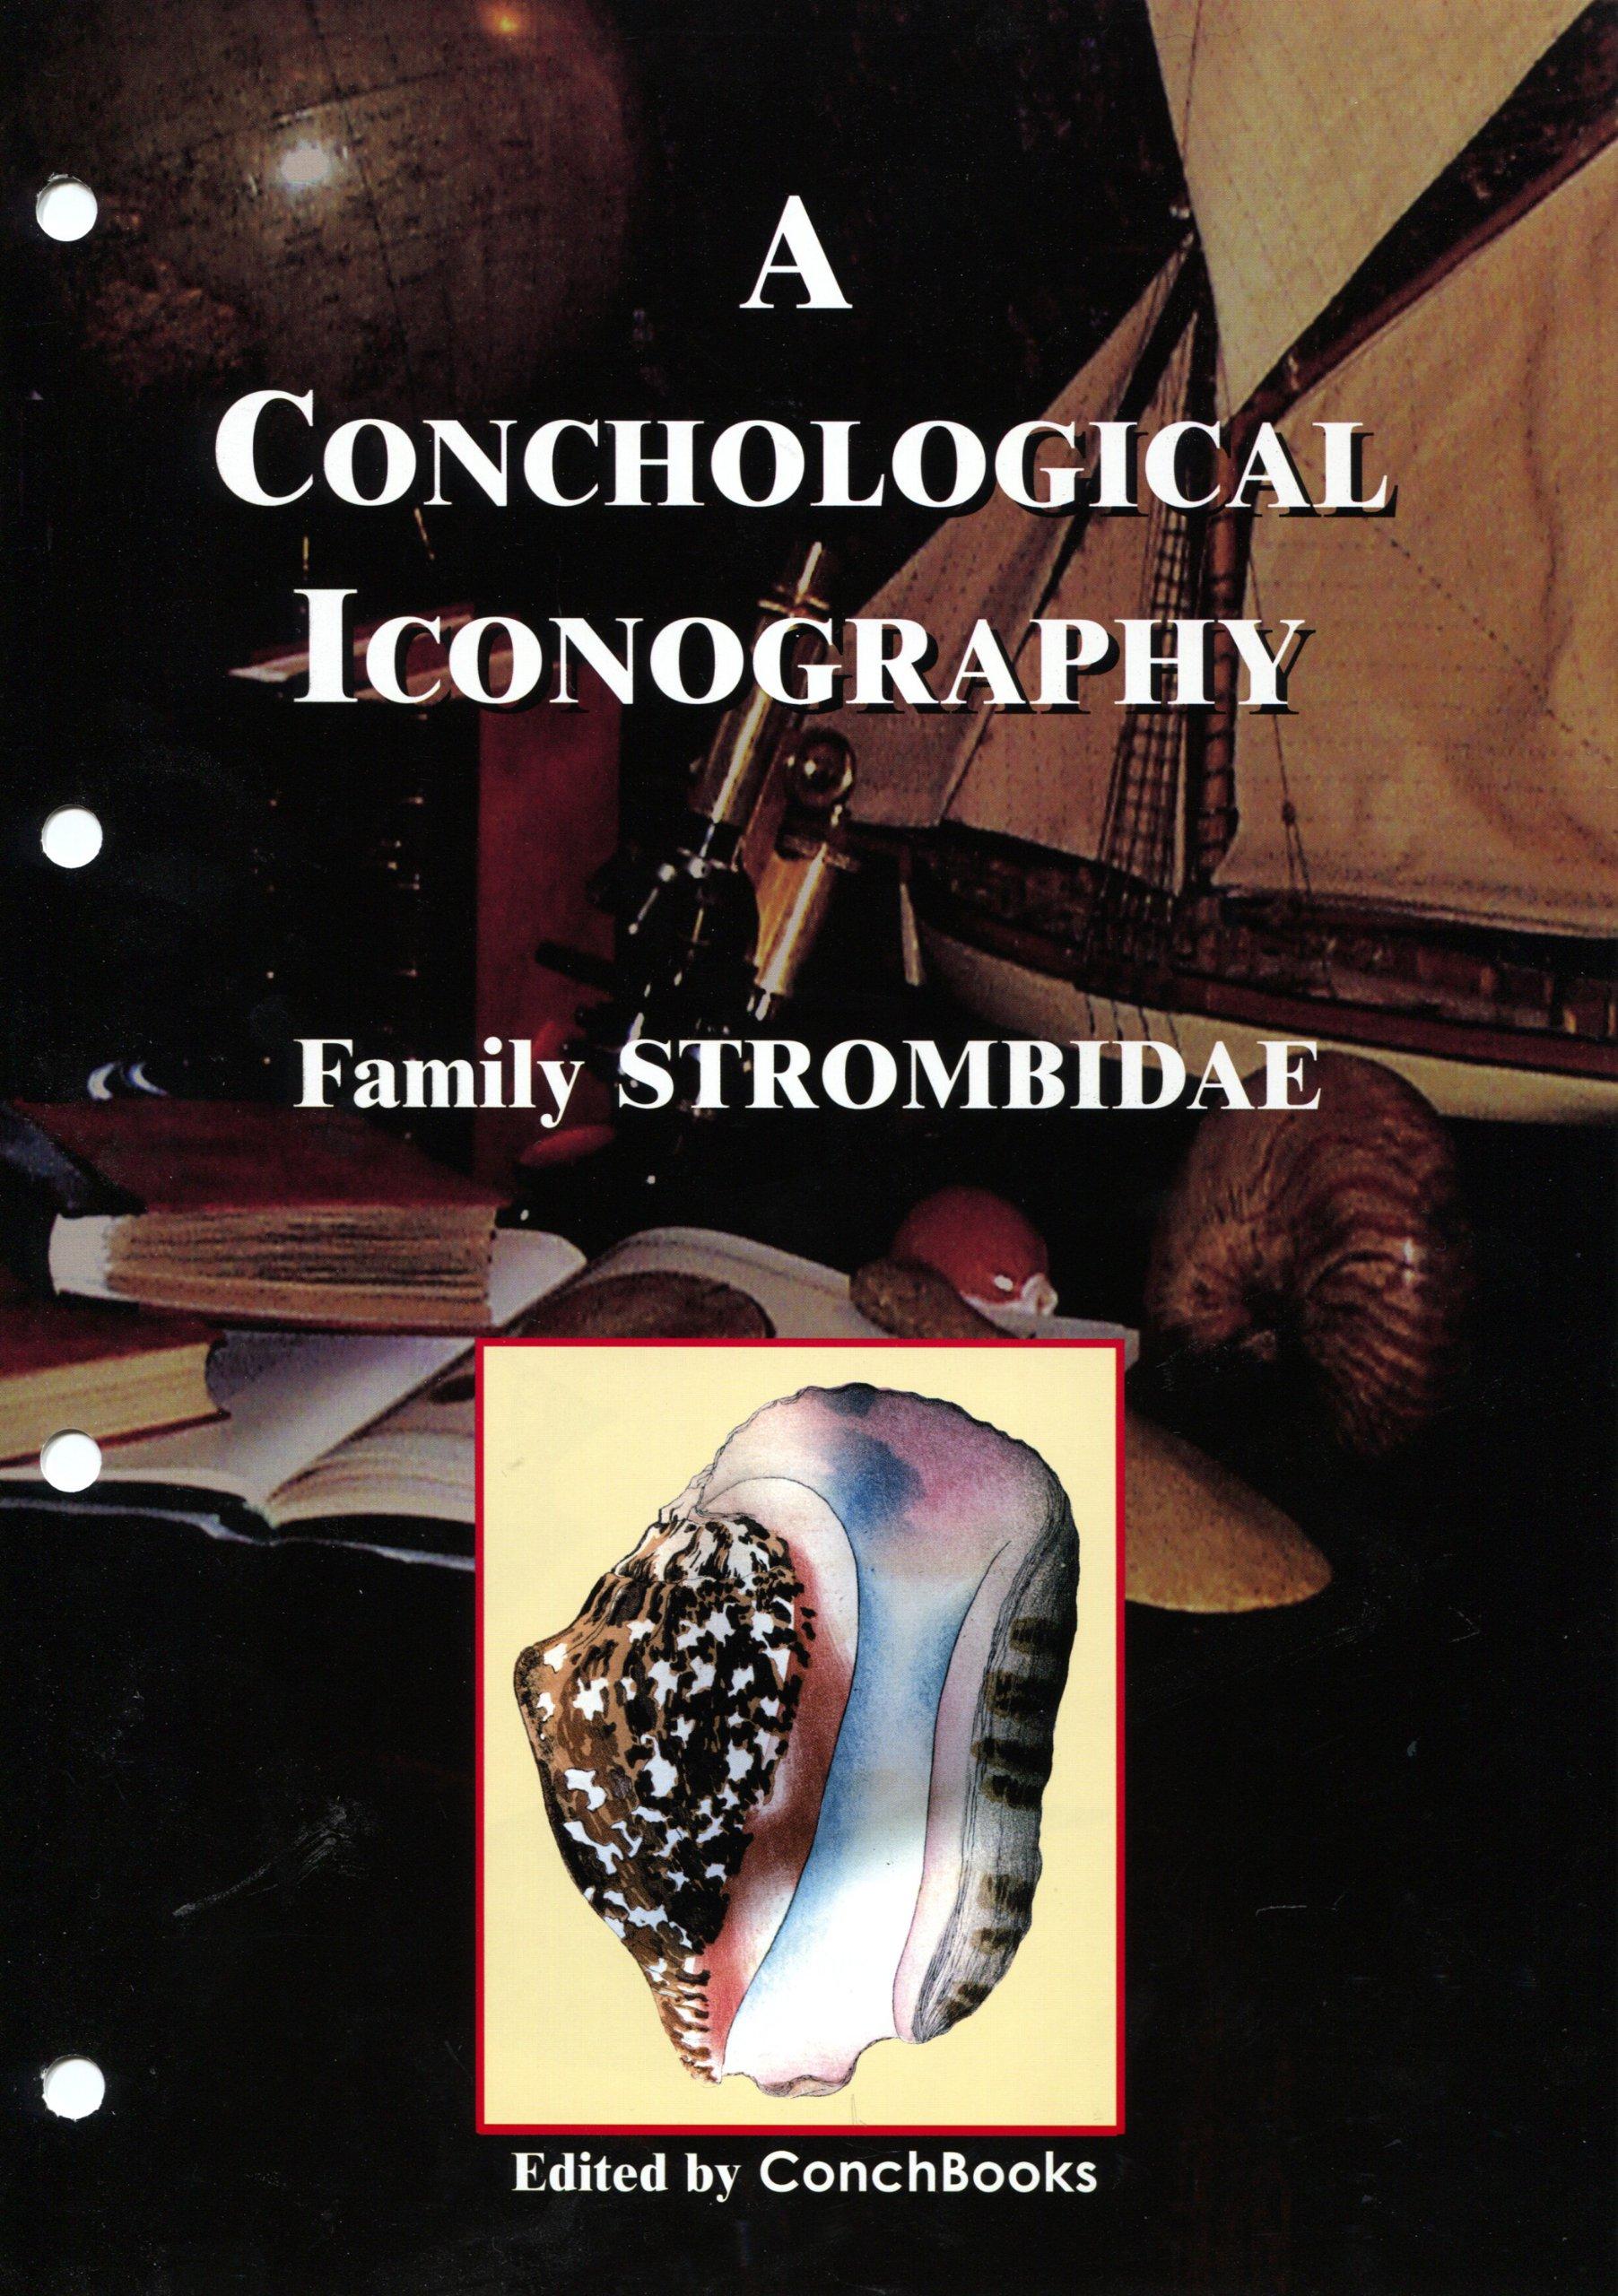 Family STROMBIDAE A Conchological Iconography Kurt Kreipl